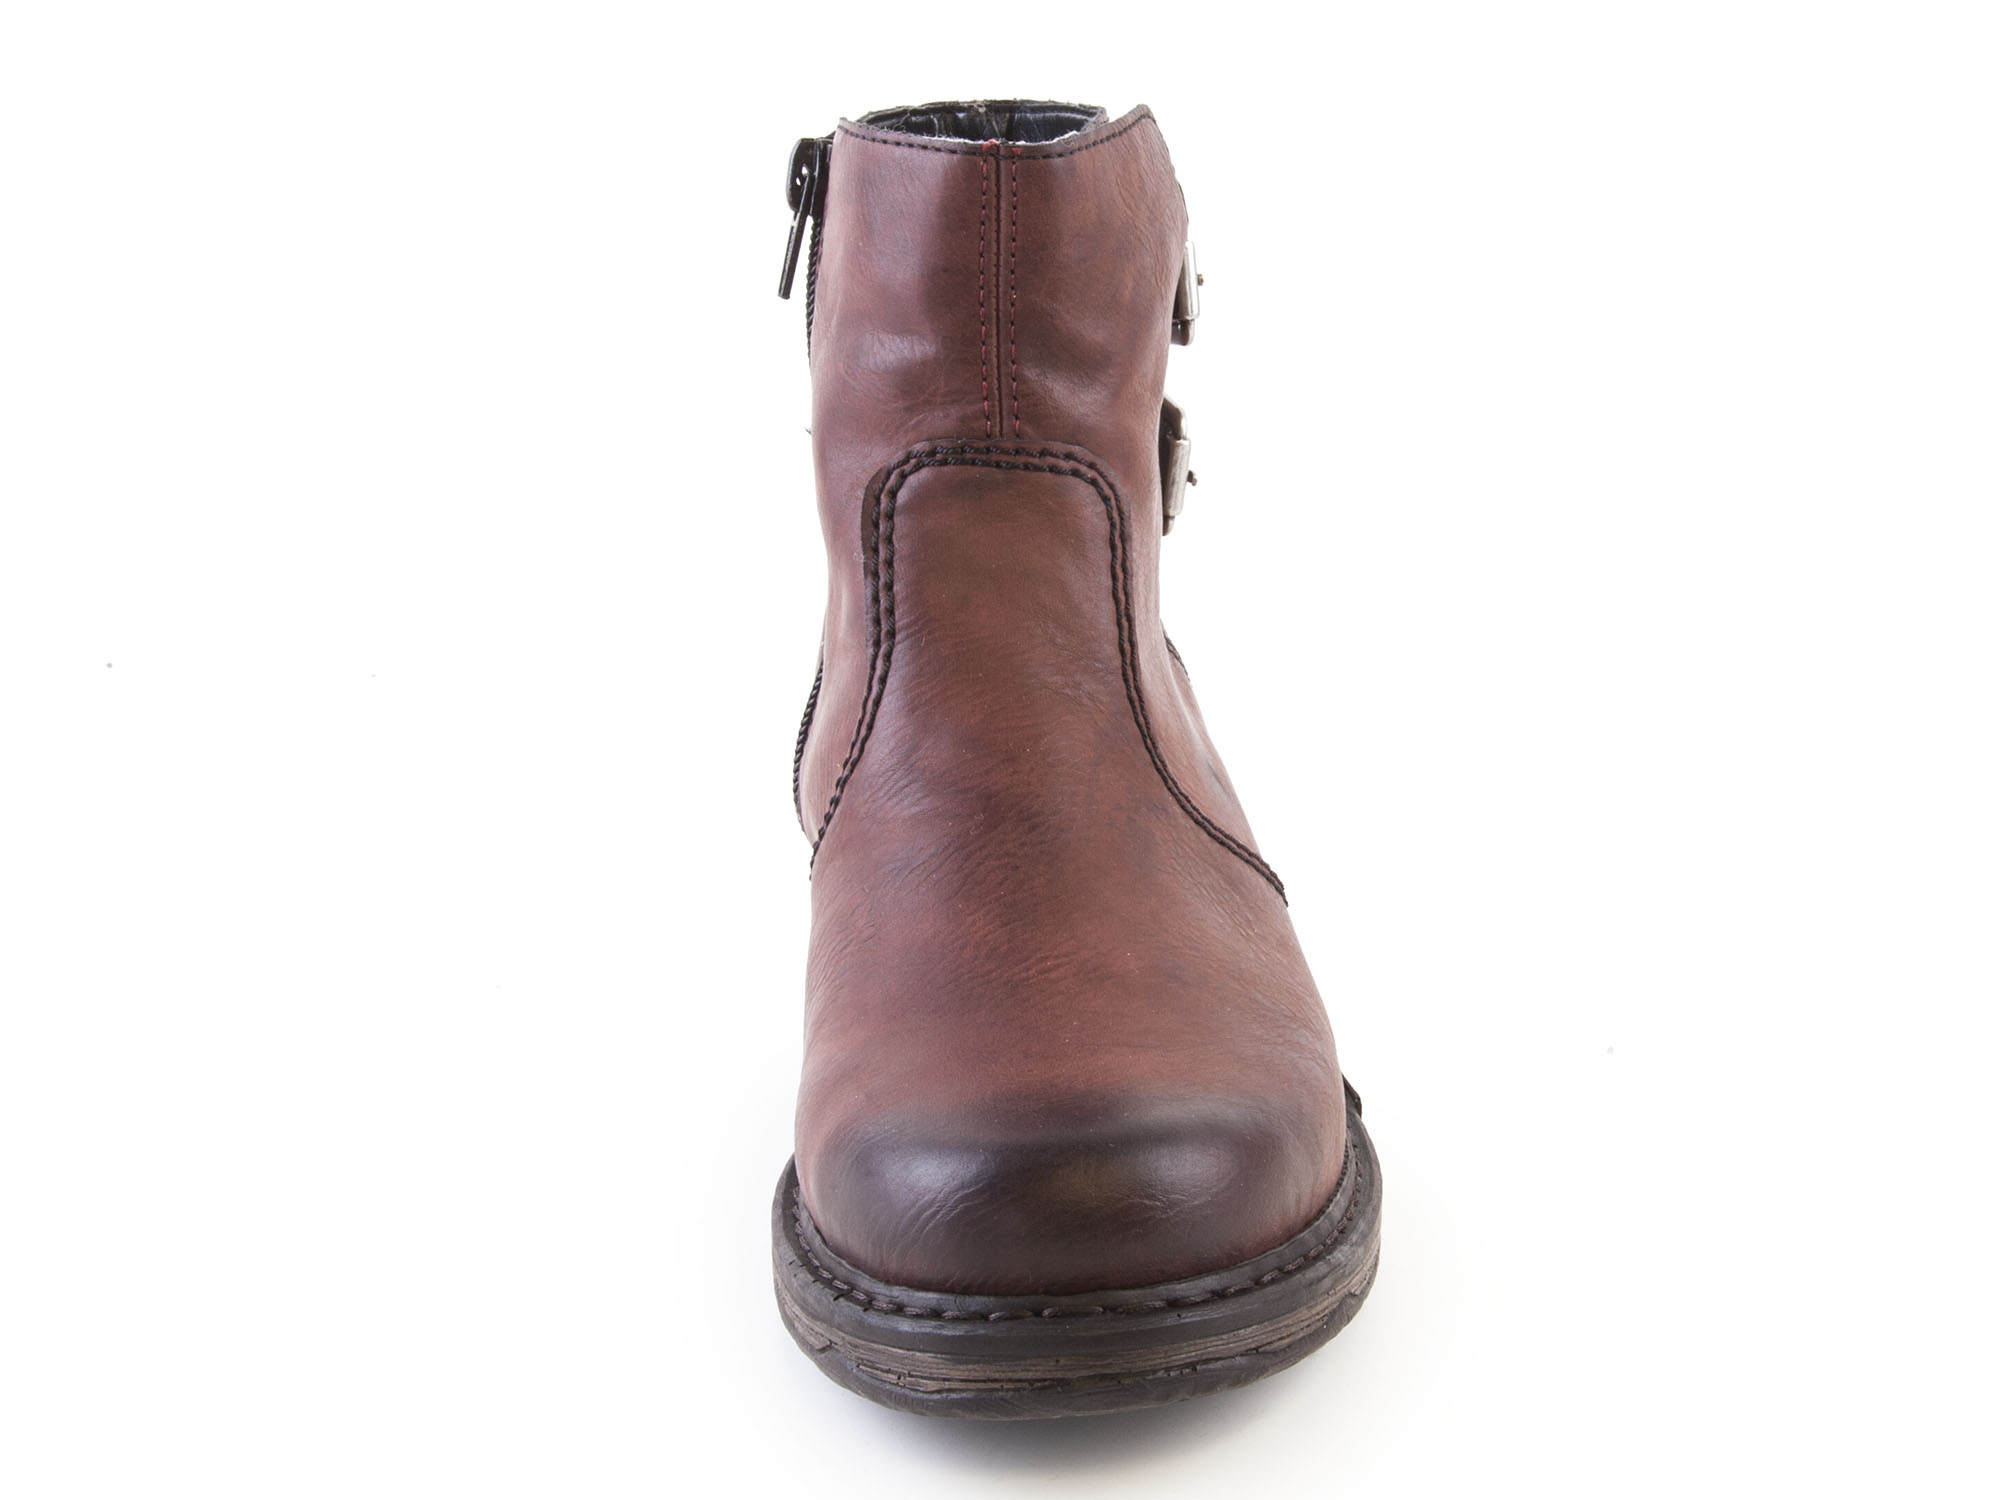 6d785273c8cb detail Dámská obuv RIEKER br Z9954 35 ROT H W 7